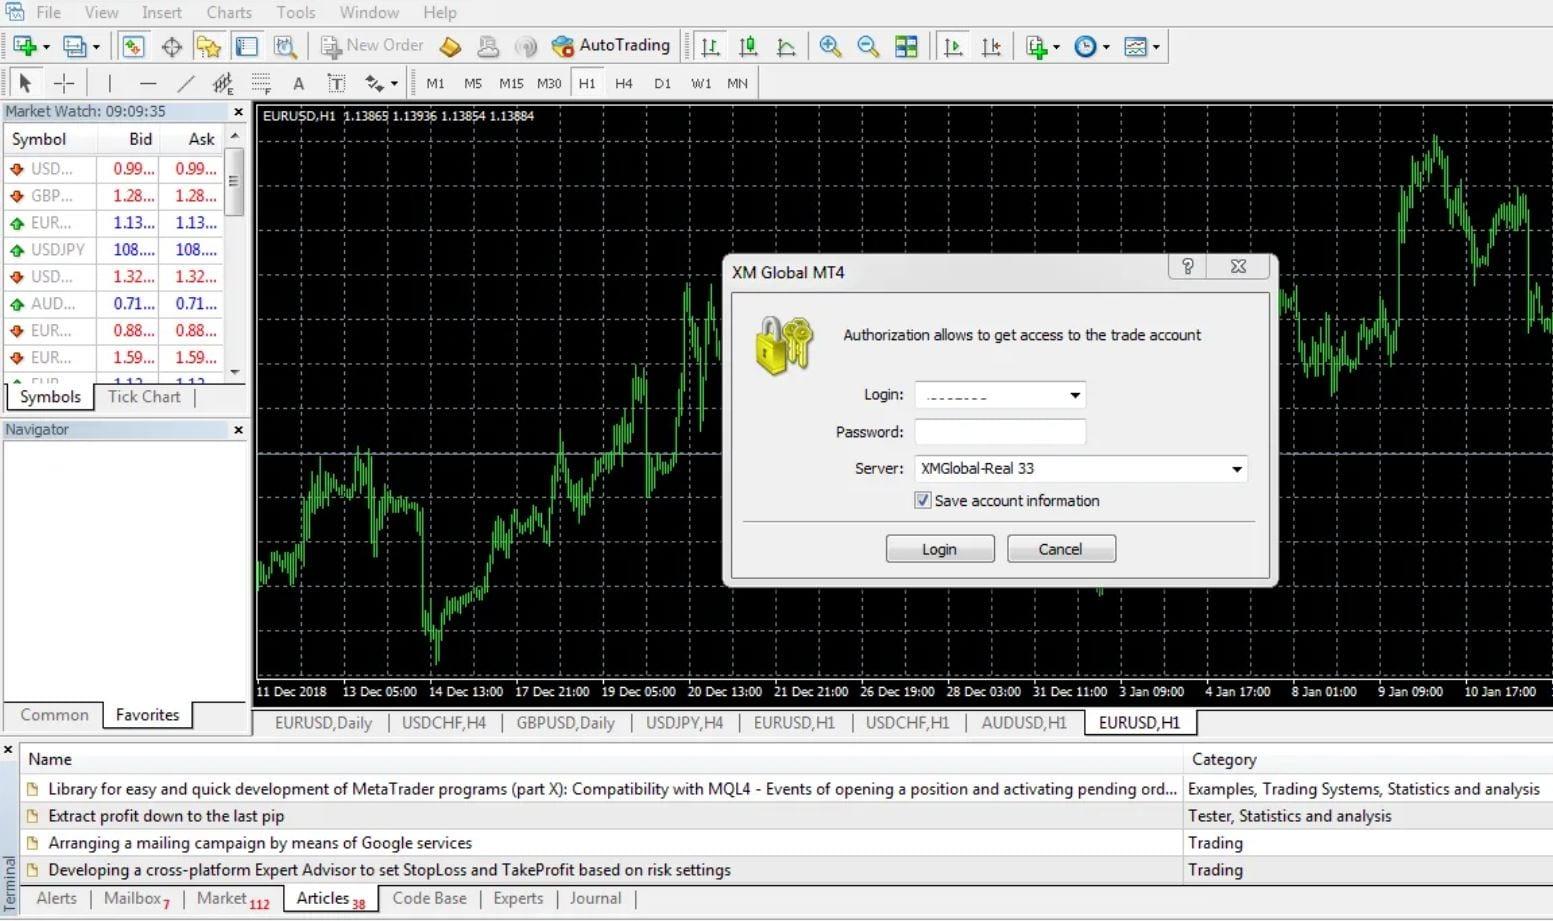 Logging into MetaTrader 4 for XM